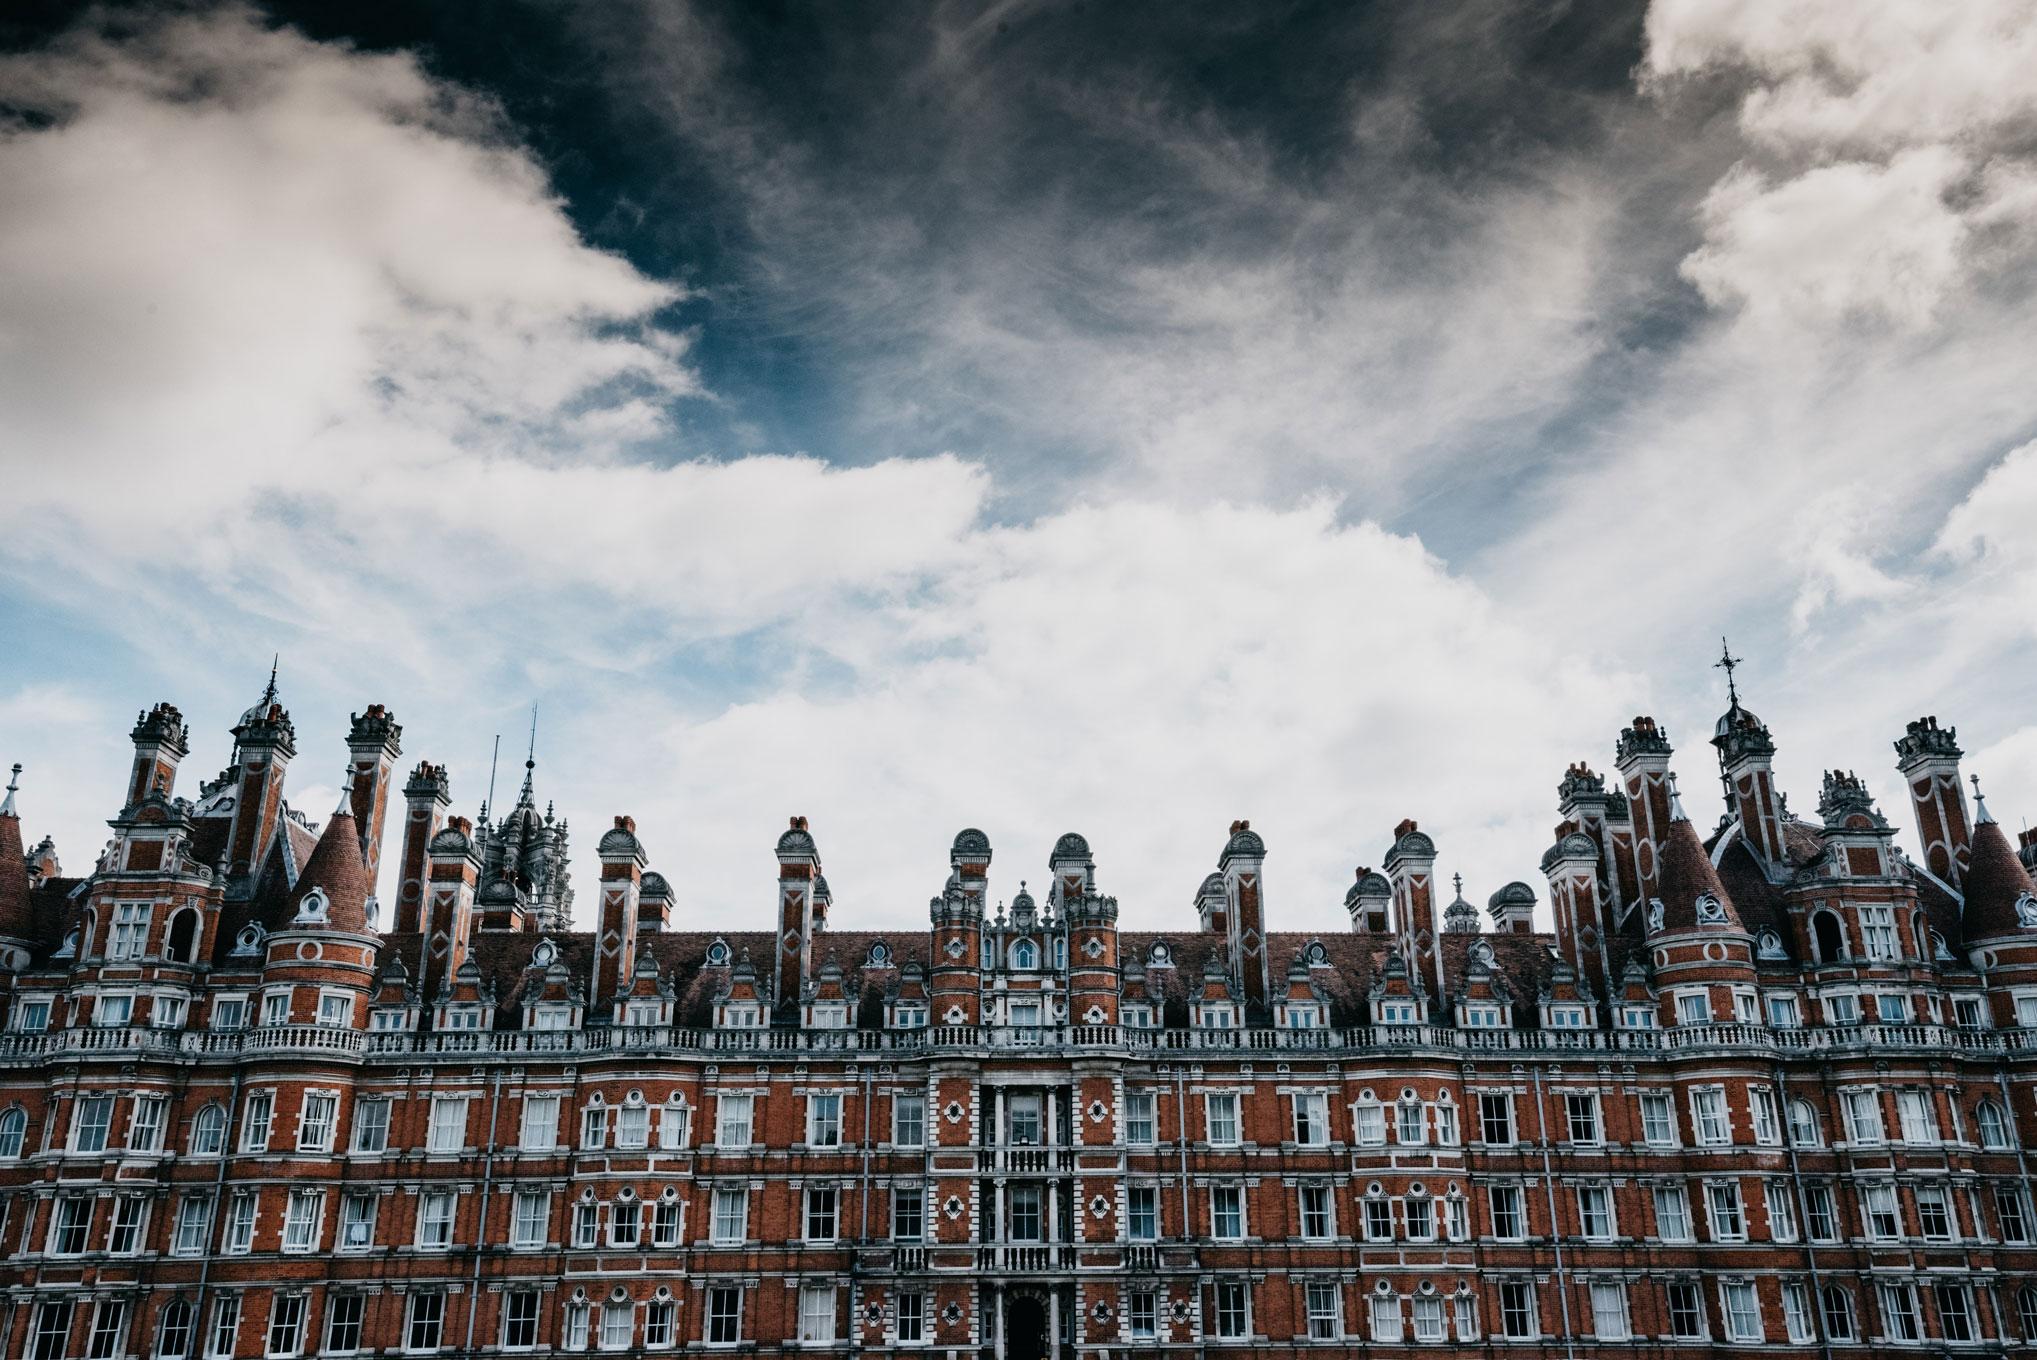 grounds of Royal Holloway University of London.